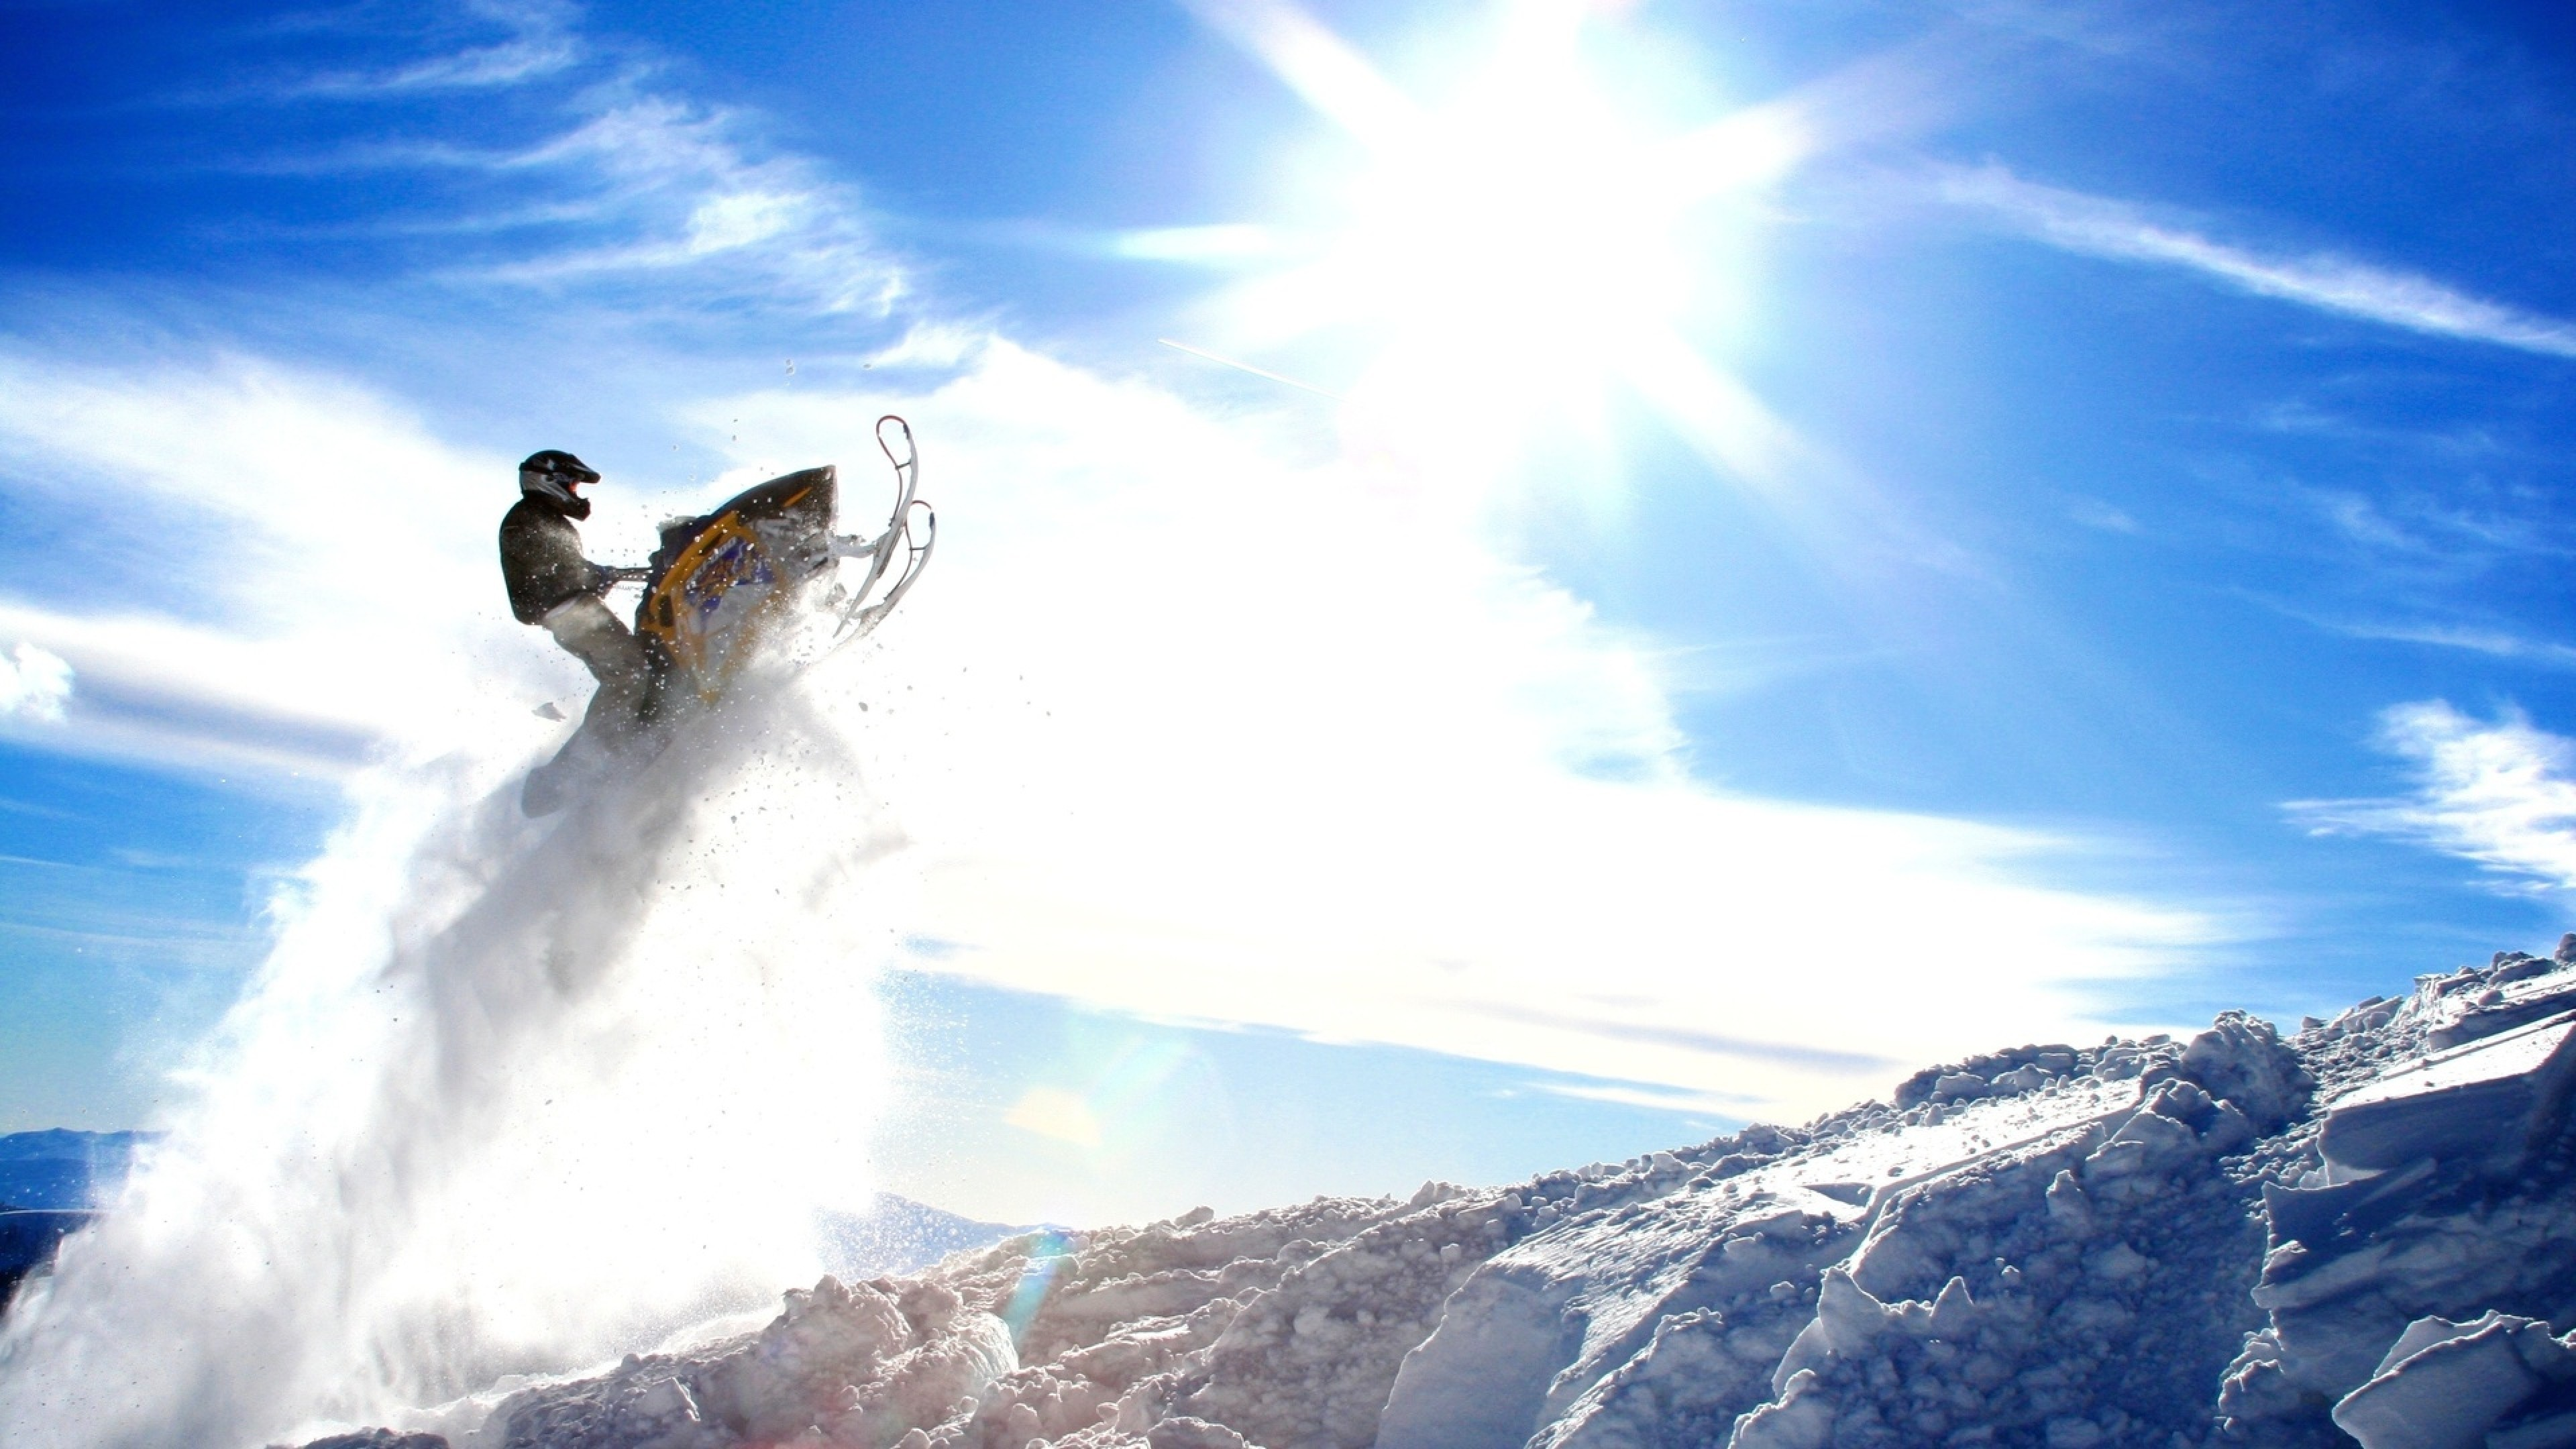 ski doo wallpaper (60+ images)